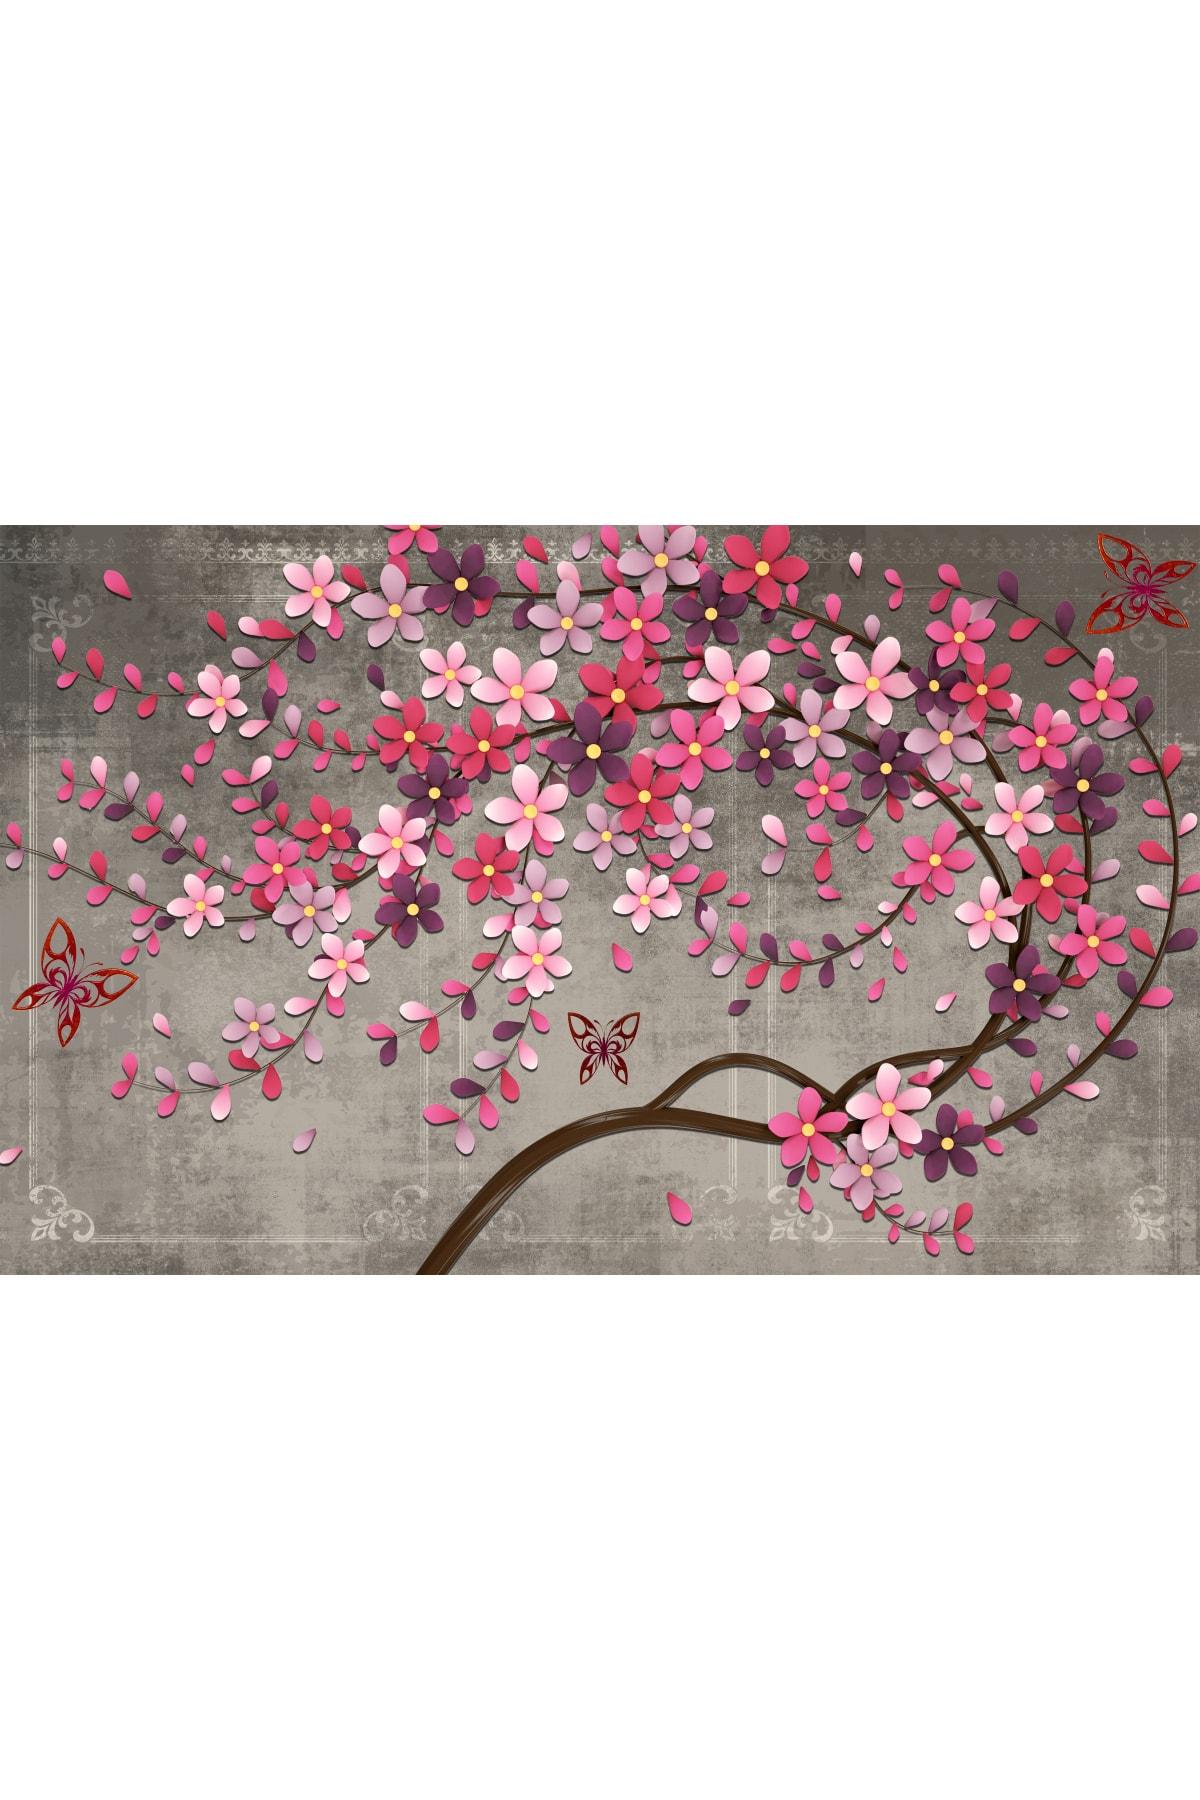 Zeta Aks Mor Çiçekli Ağaç Tek Parça Cotton Canvas Tablo 2